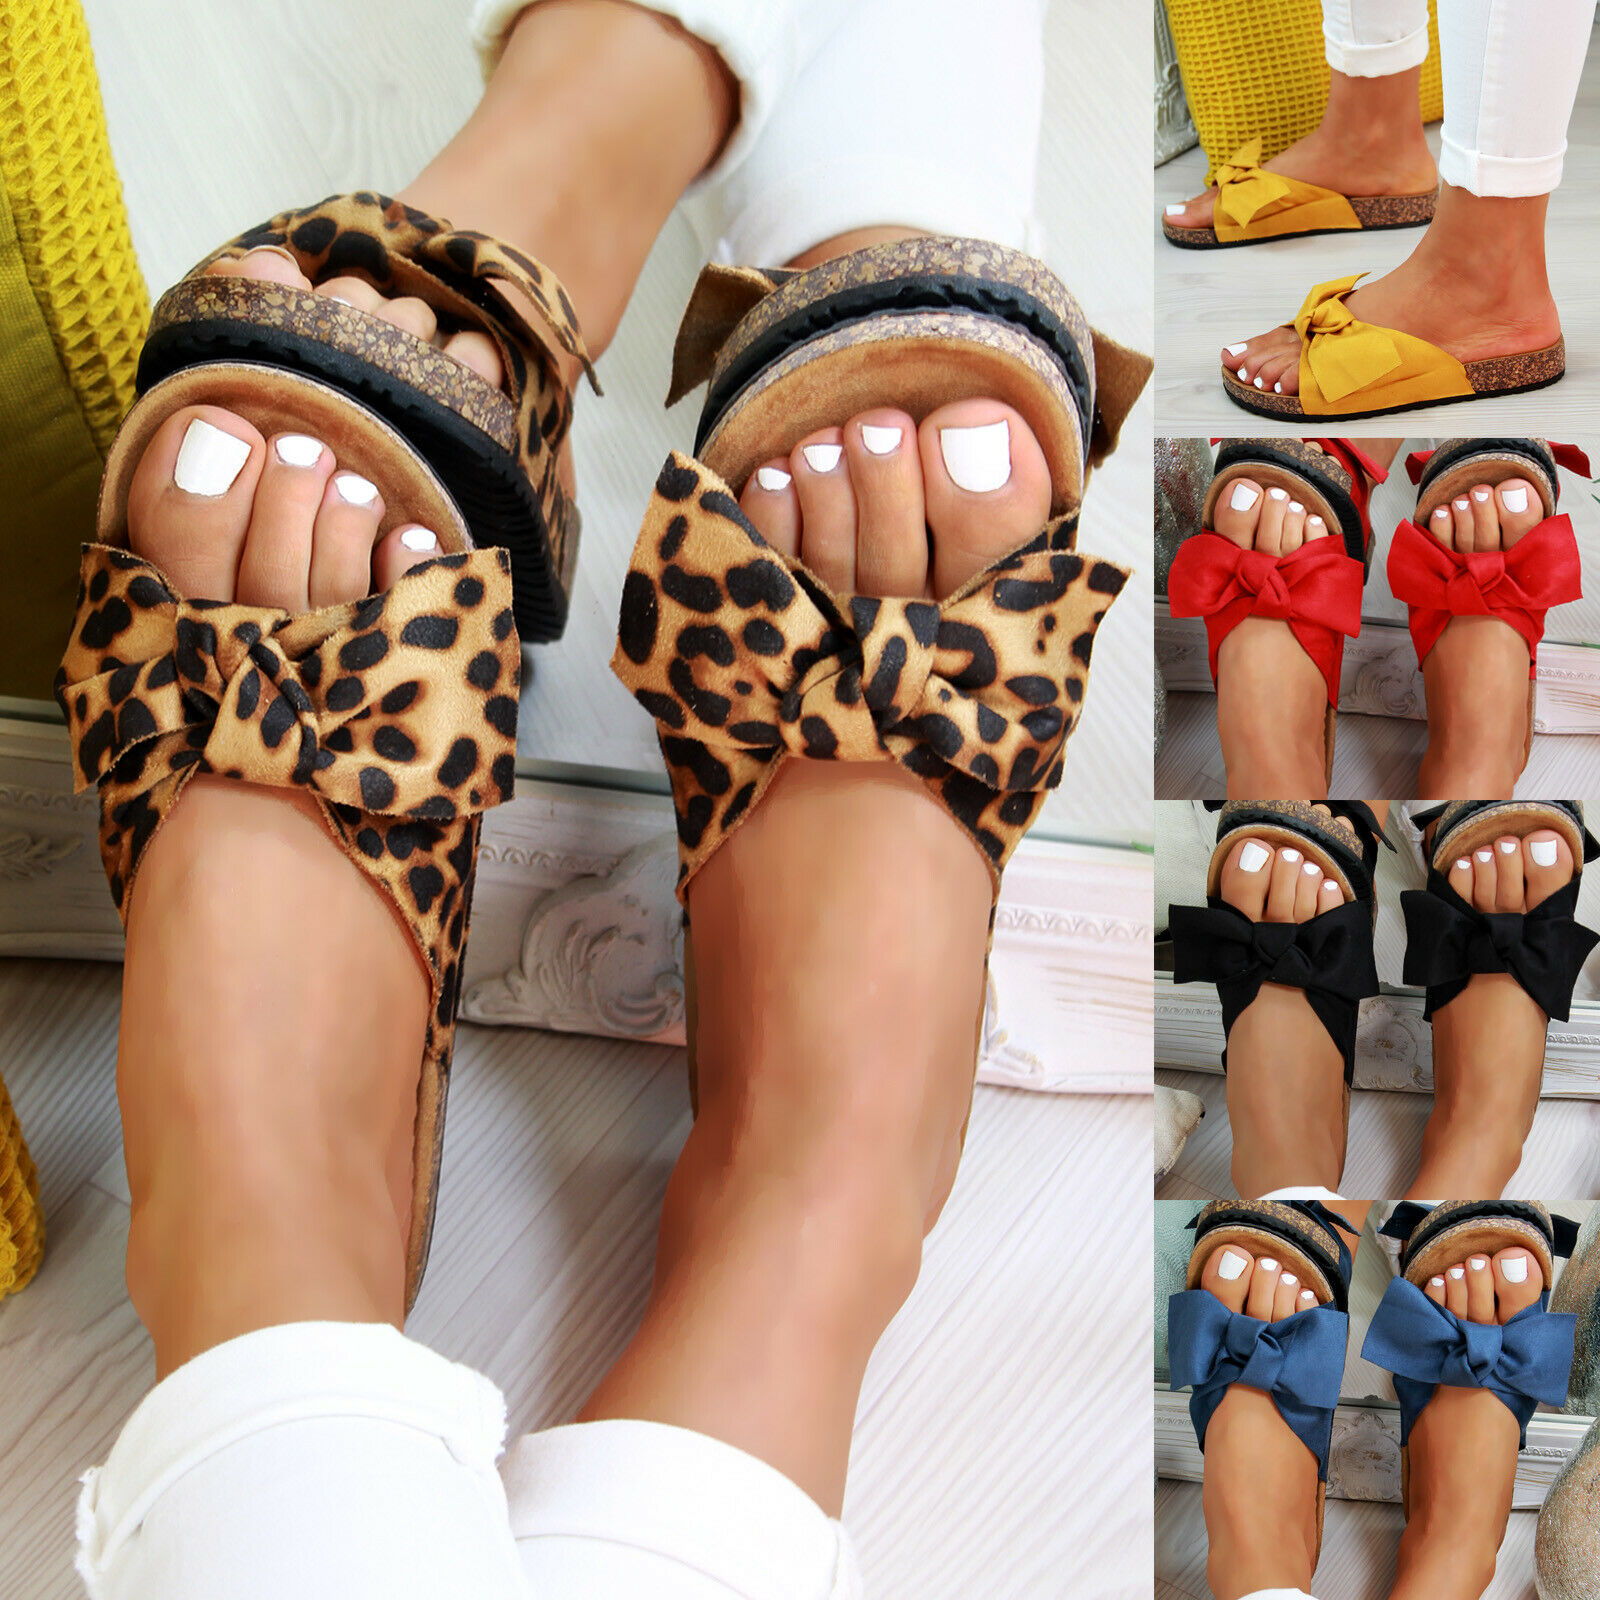 Oeak Summer New Womans Slip On Sliders Bow Flatform Mule Summer Sandals Comfy Shoes Sizes 2019Oeak Summer New Womans Slip On Sliders Bow Flatform Mule Summer Sandals Comfy Shoes Sizes 2019